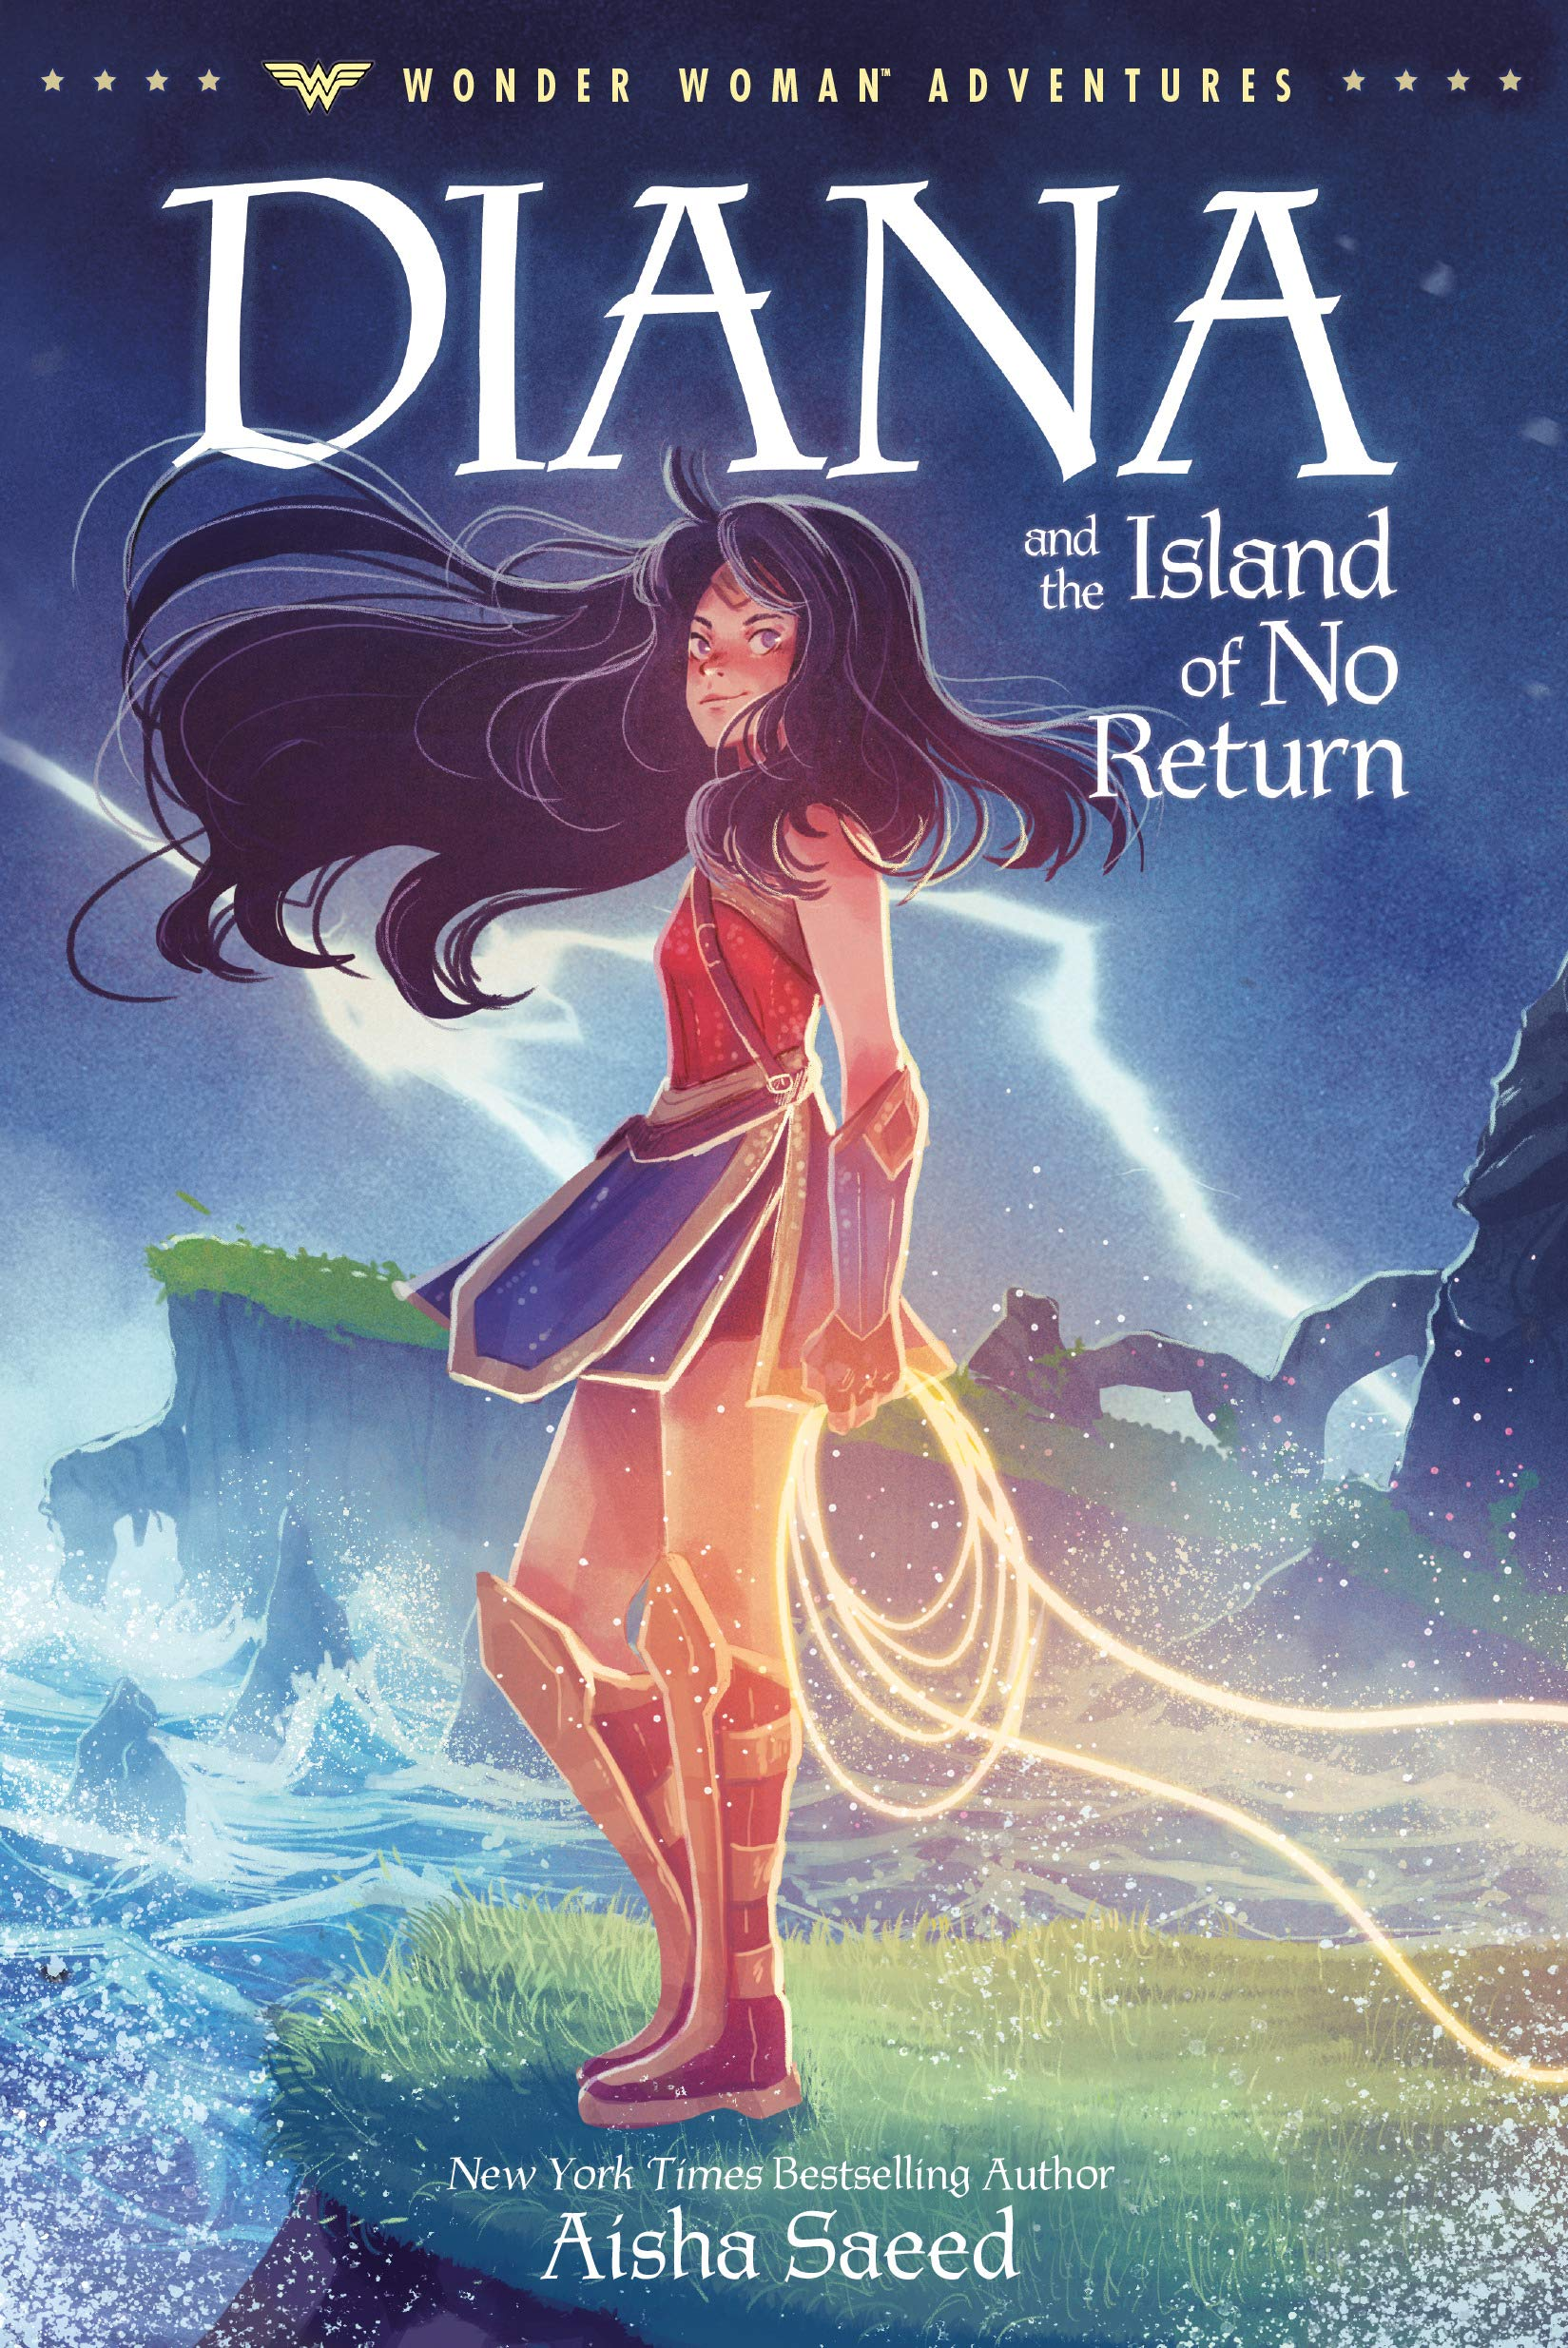 Diana and the Island of No Return by Aisha Saeed